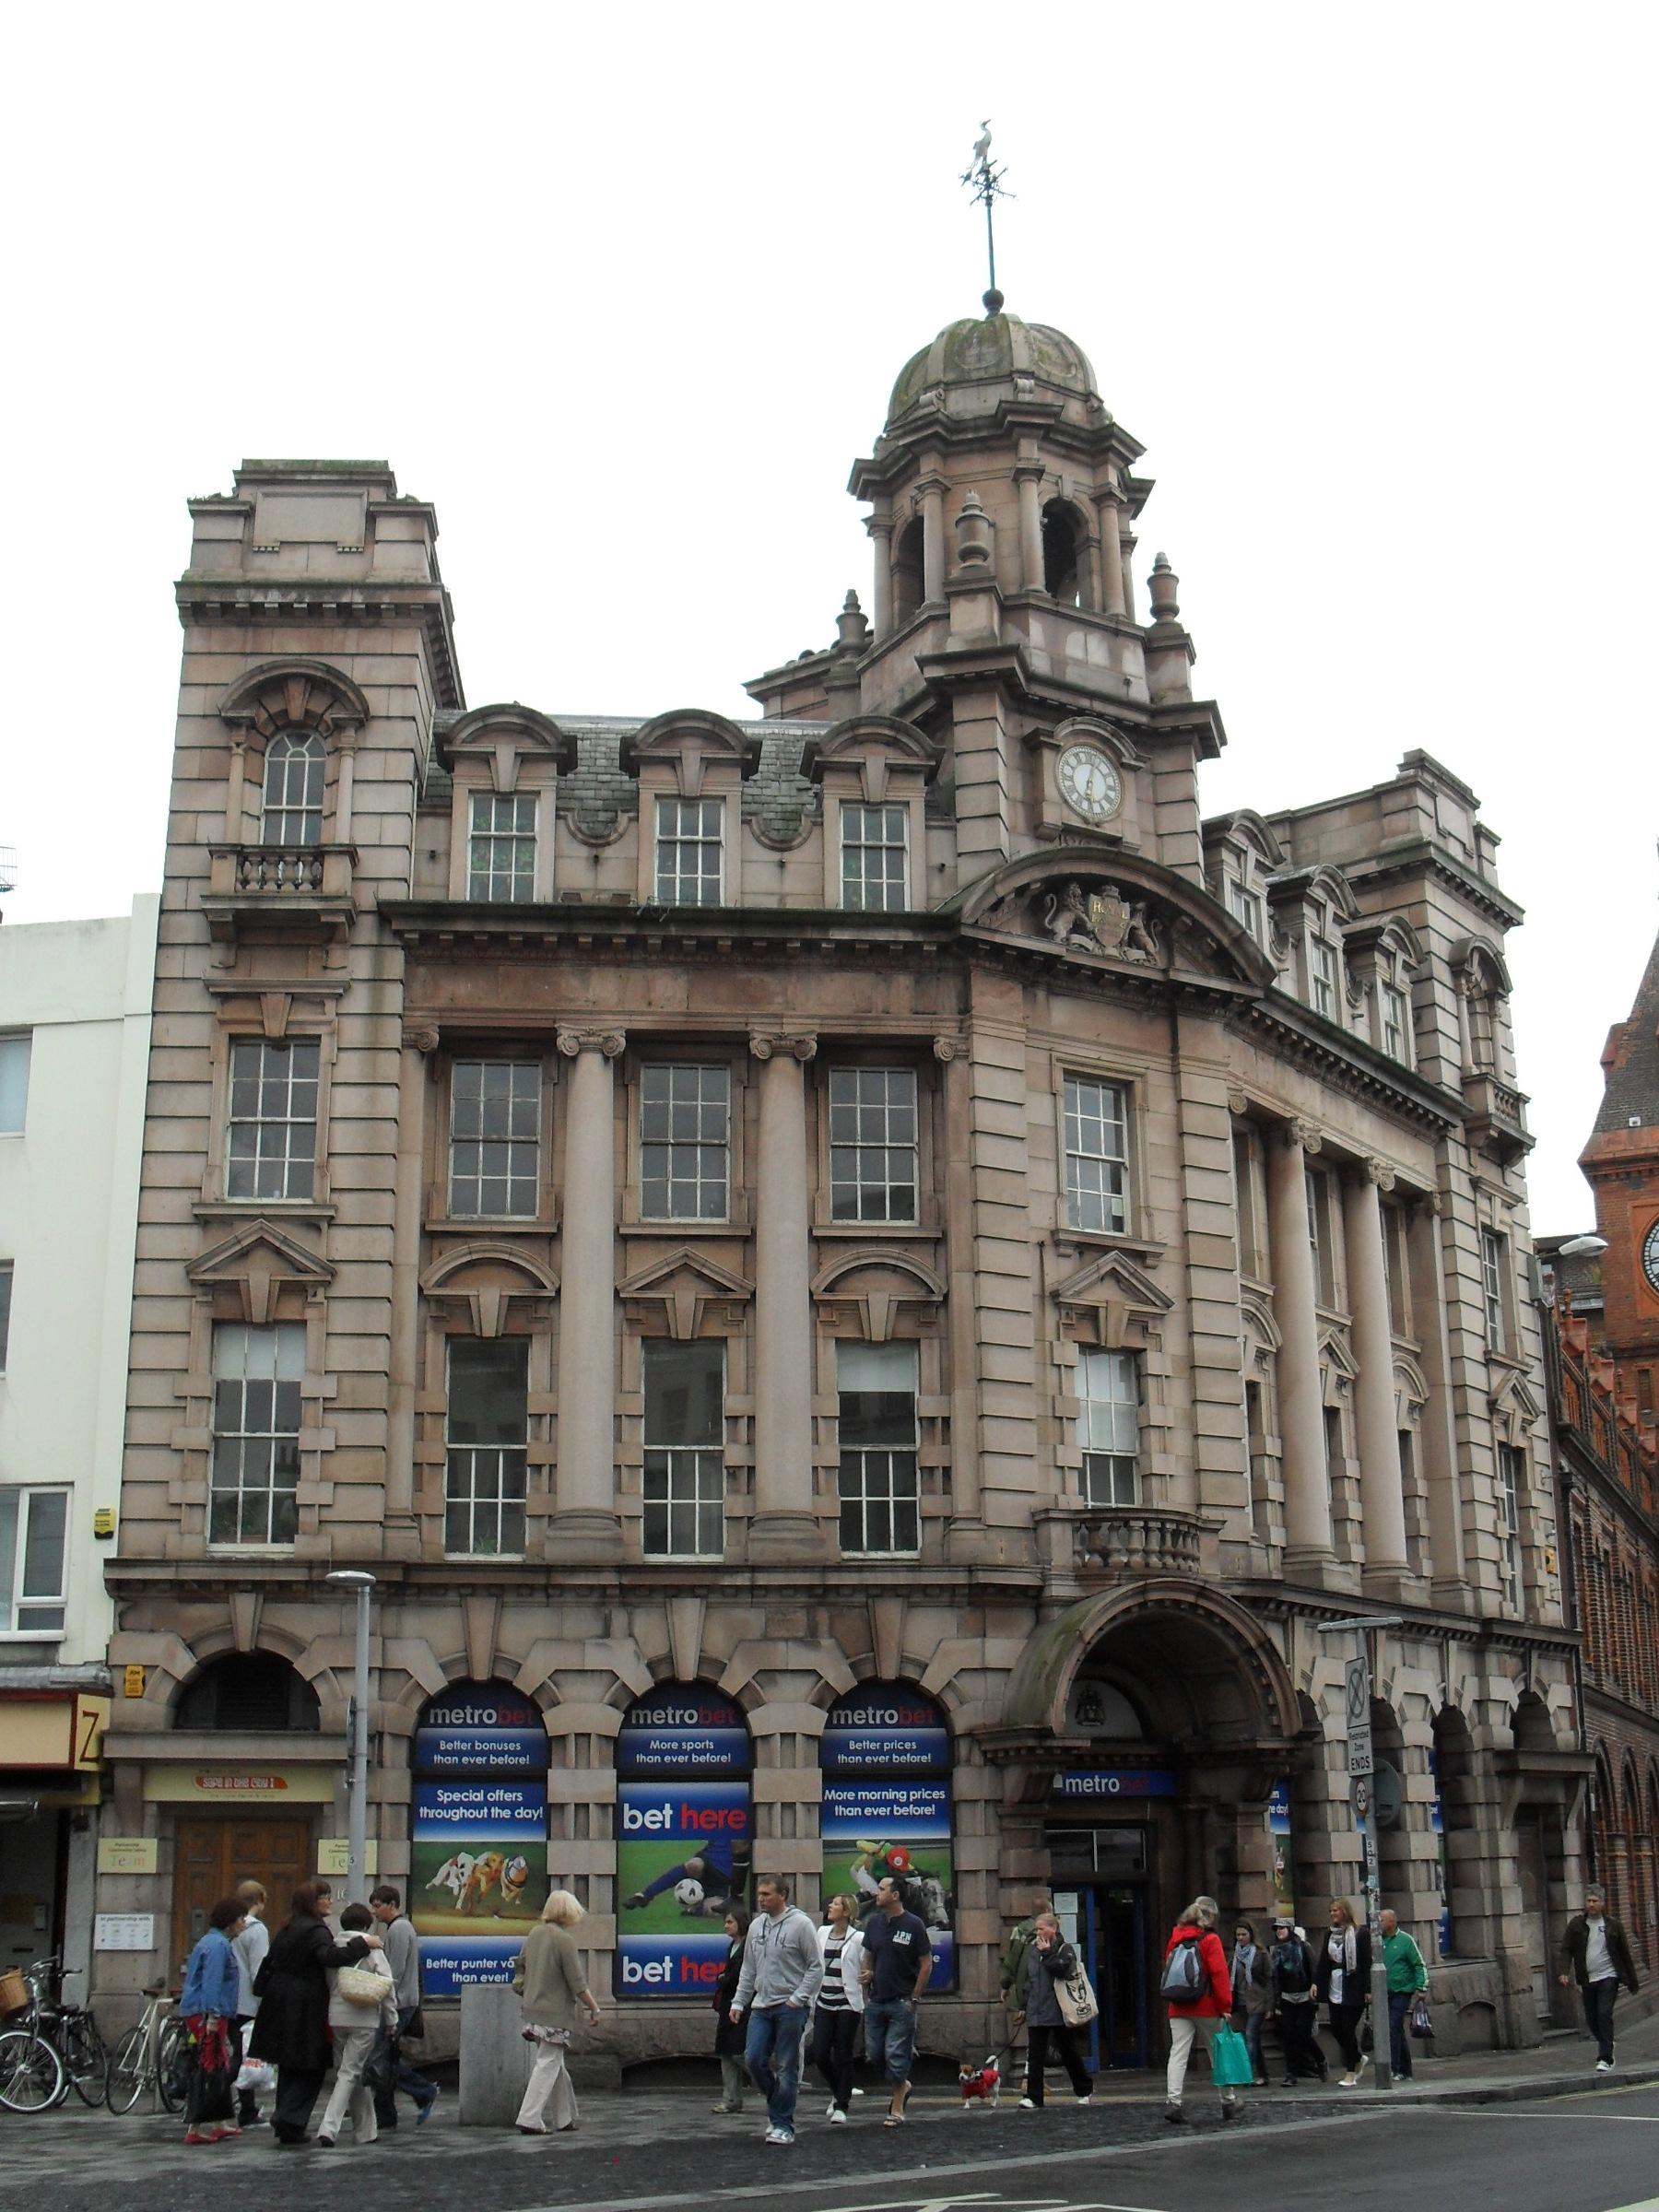 File:163 North Street, Brighton (IoE Code 480945).jpg - Wikipedia